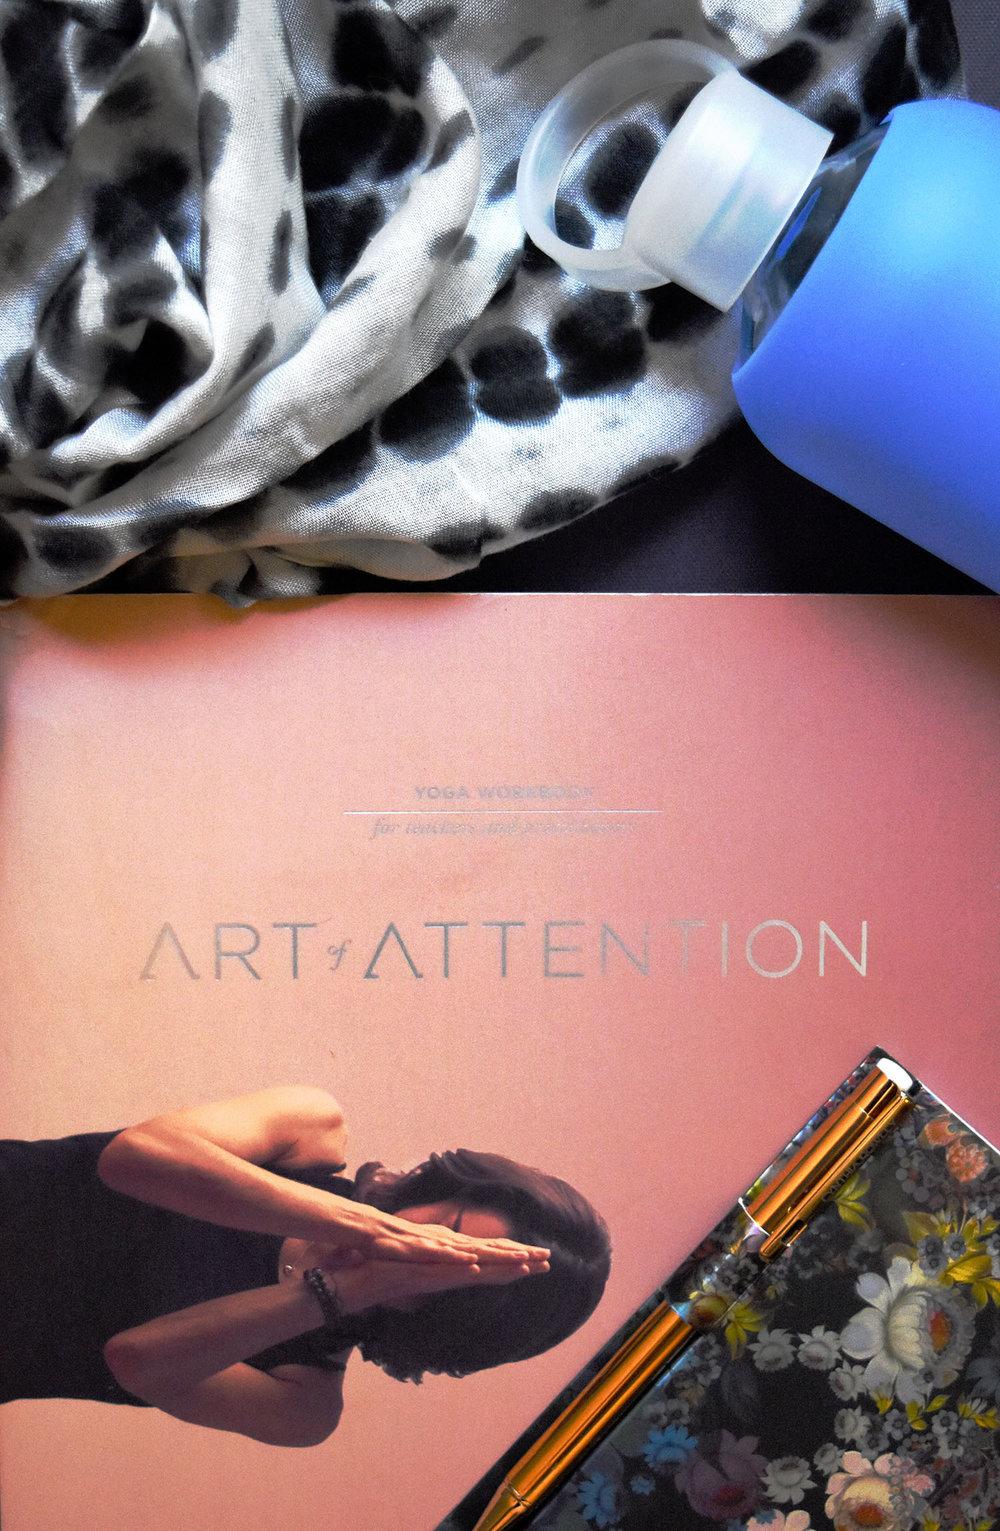 artoattention1.jpg